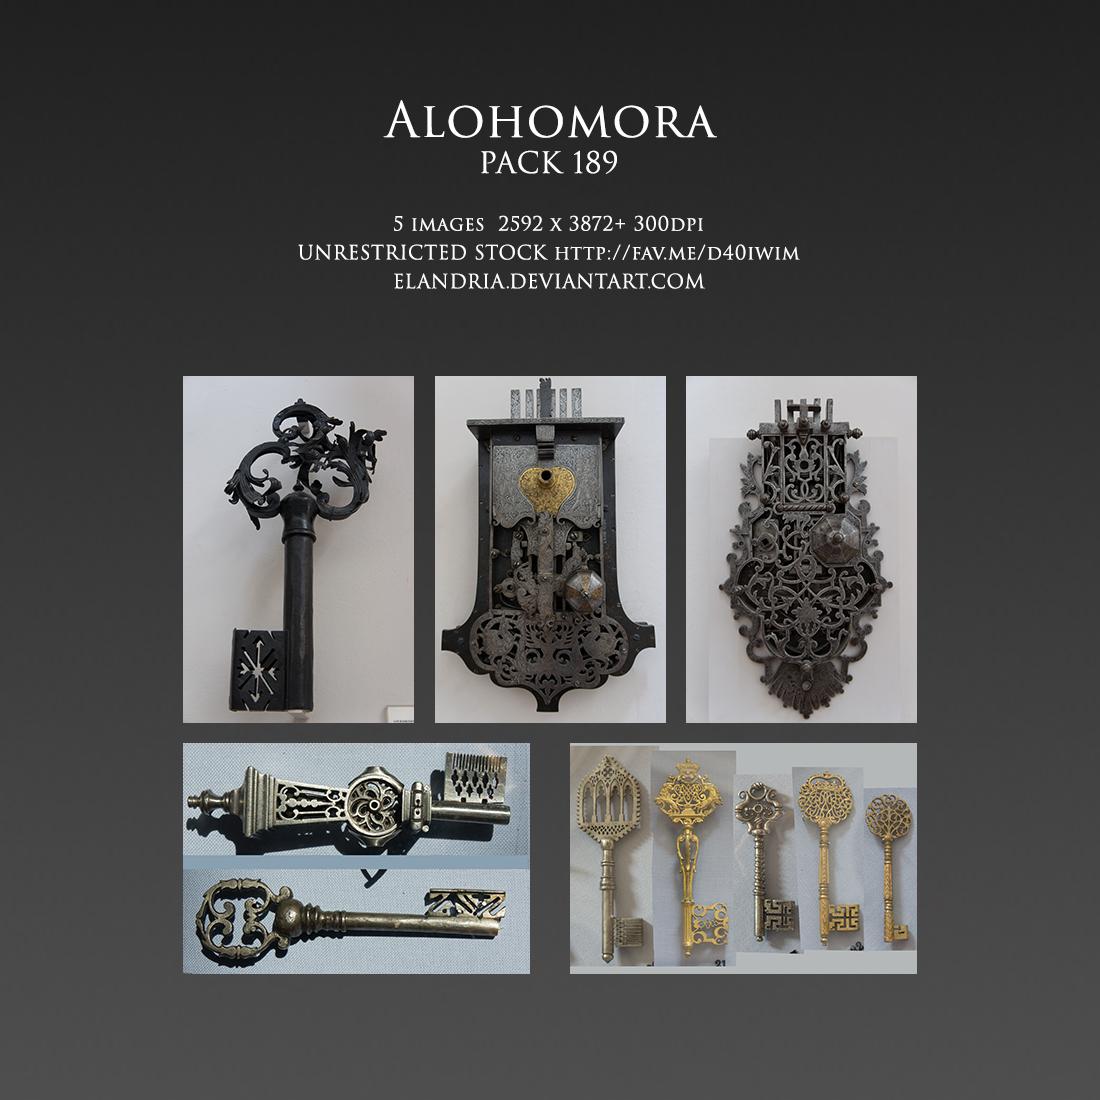 Pack189 Alohomora UNRESTRICTED